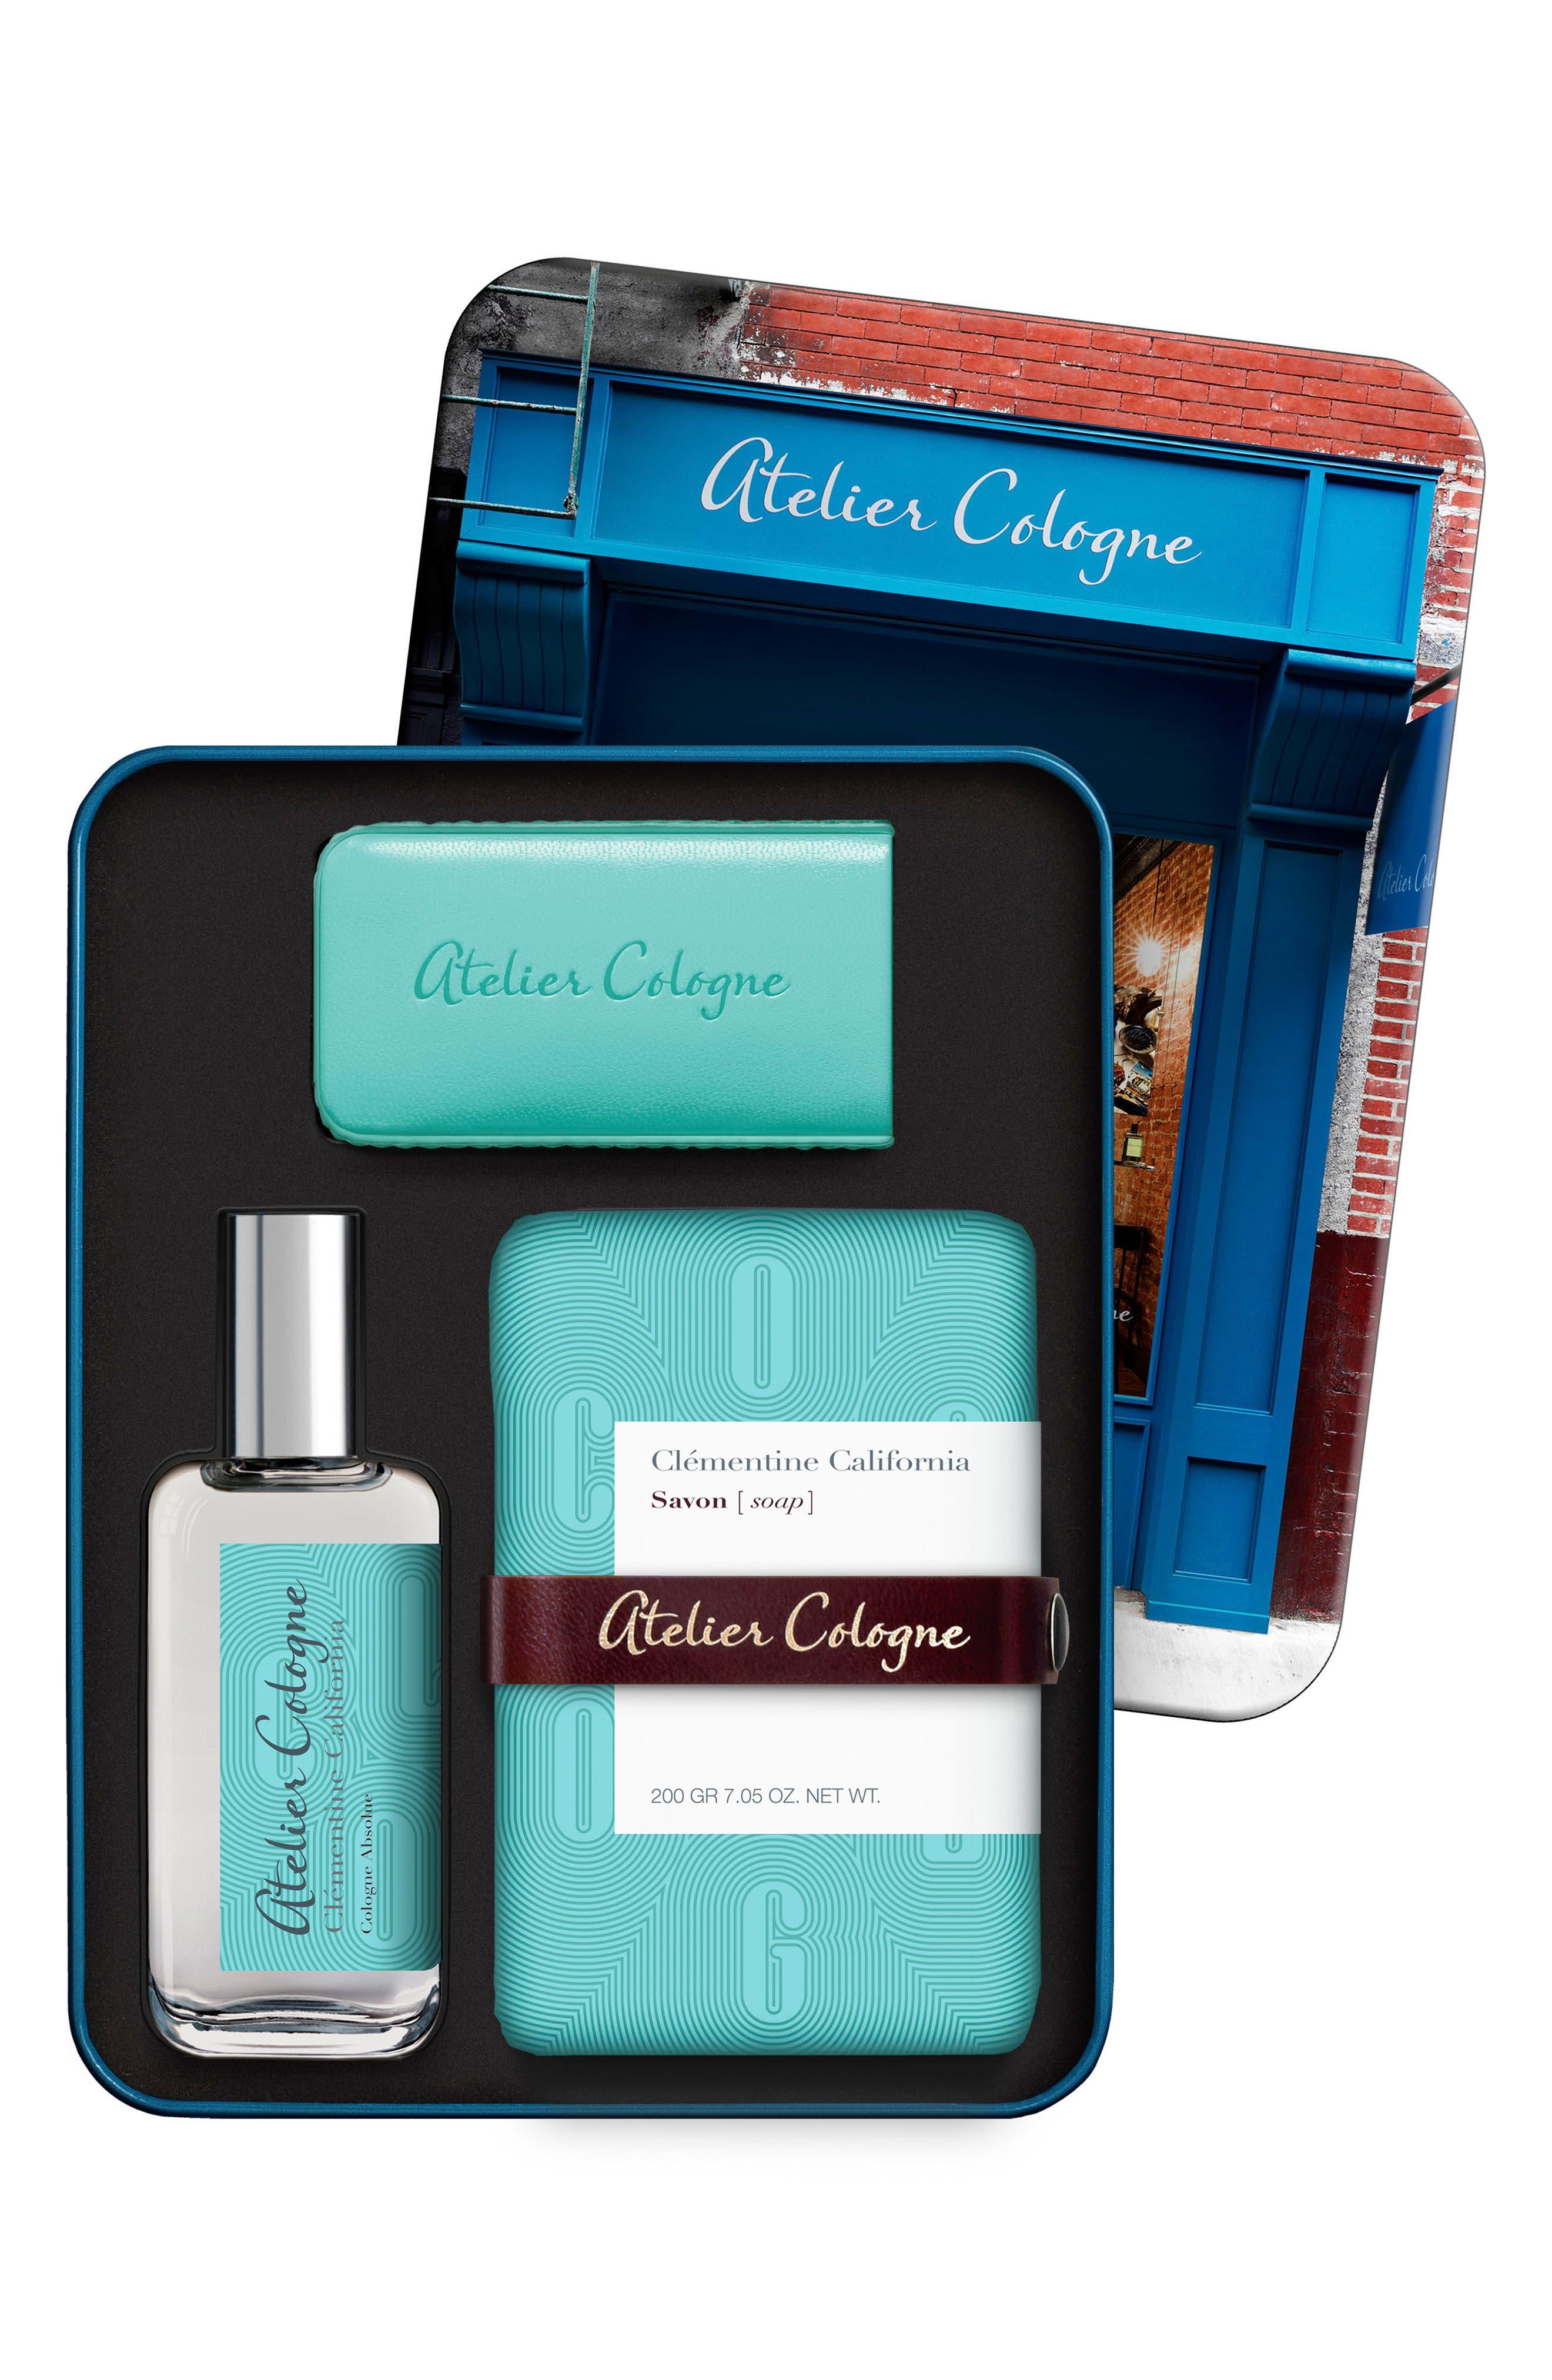 Alternate Image 1 Selected - Atelier Cologne Clémentine California Nécessaire Voyage Collection (Nordstrom Exclusive) ($120 Value)